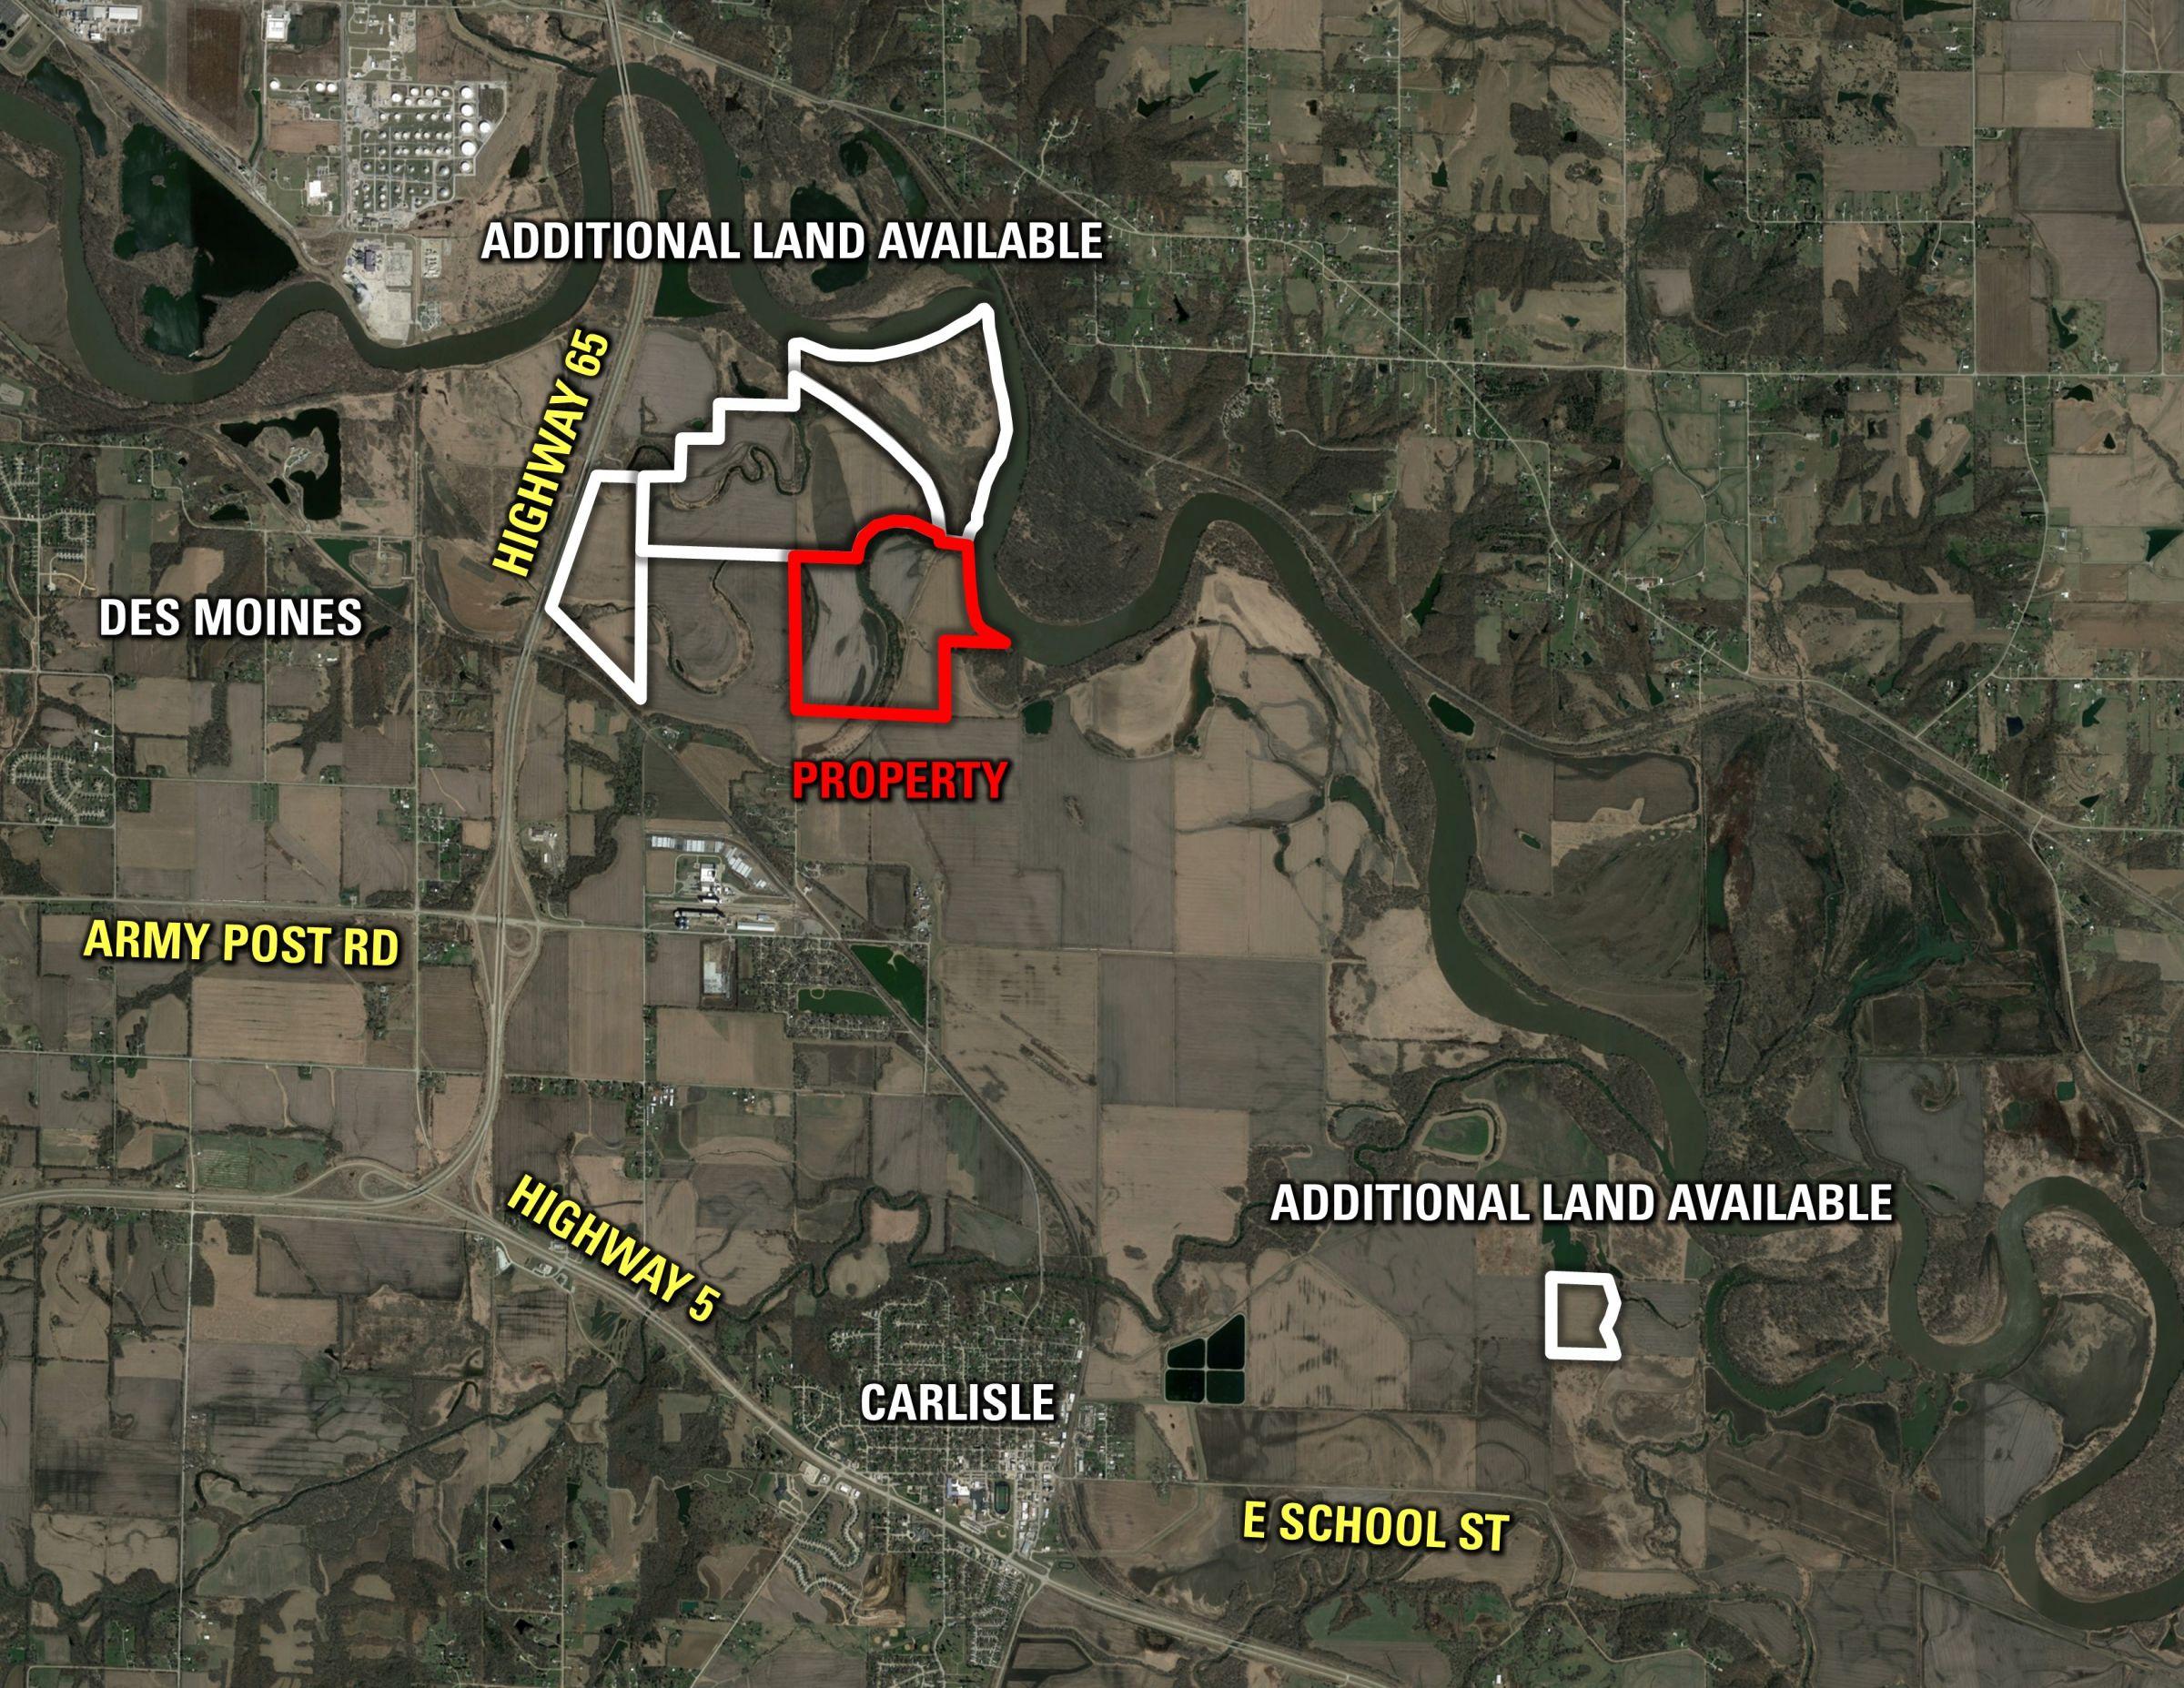 land-polk-county-iowa-202-acres-listing-number-15625-1-2021-07-09-140503.jpg